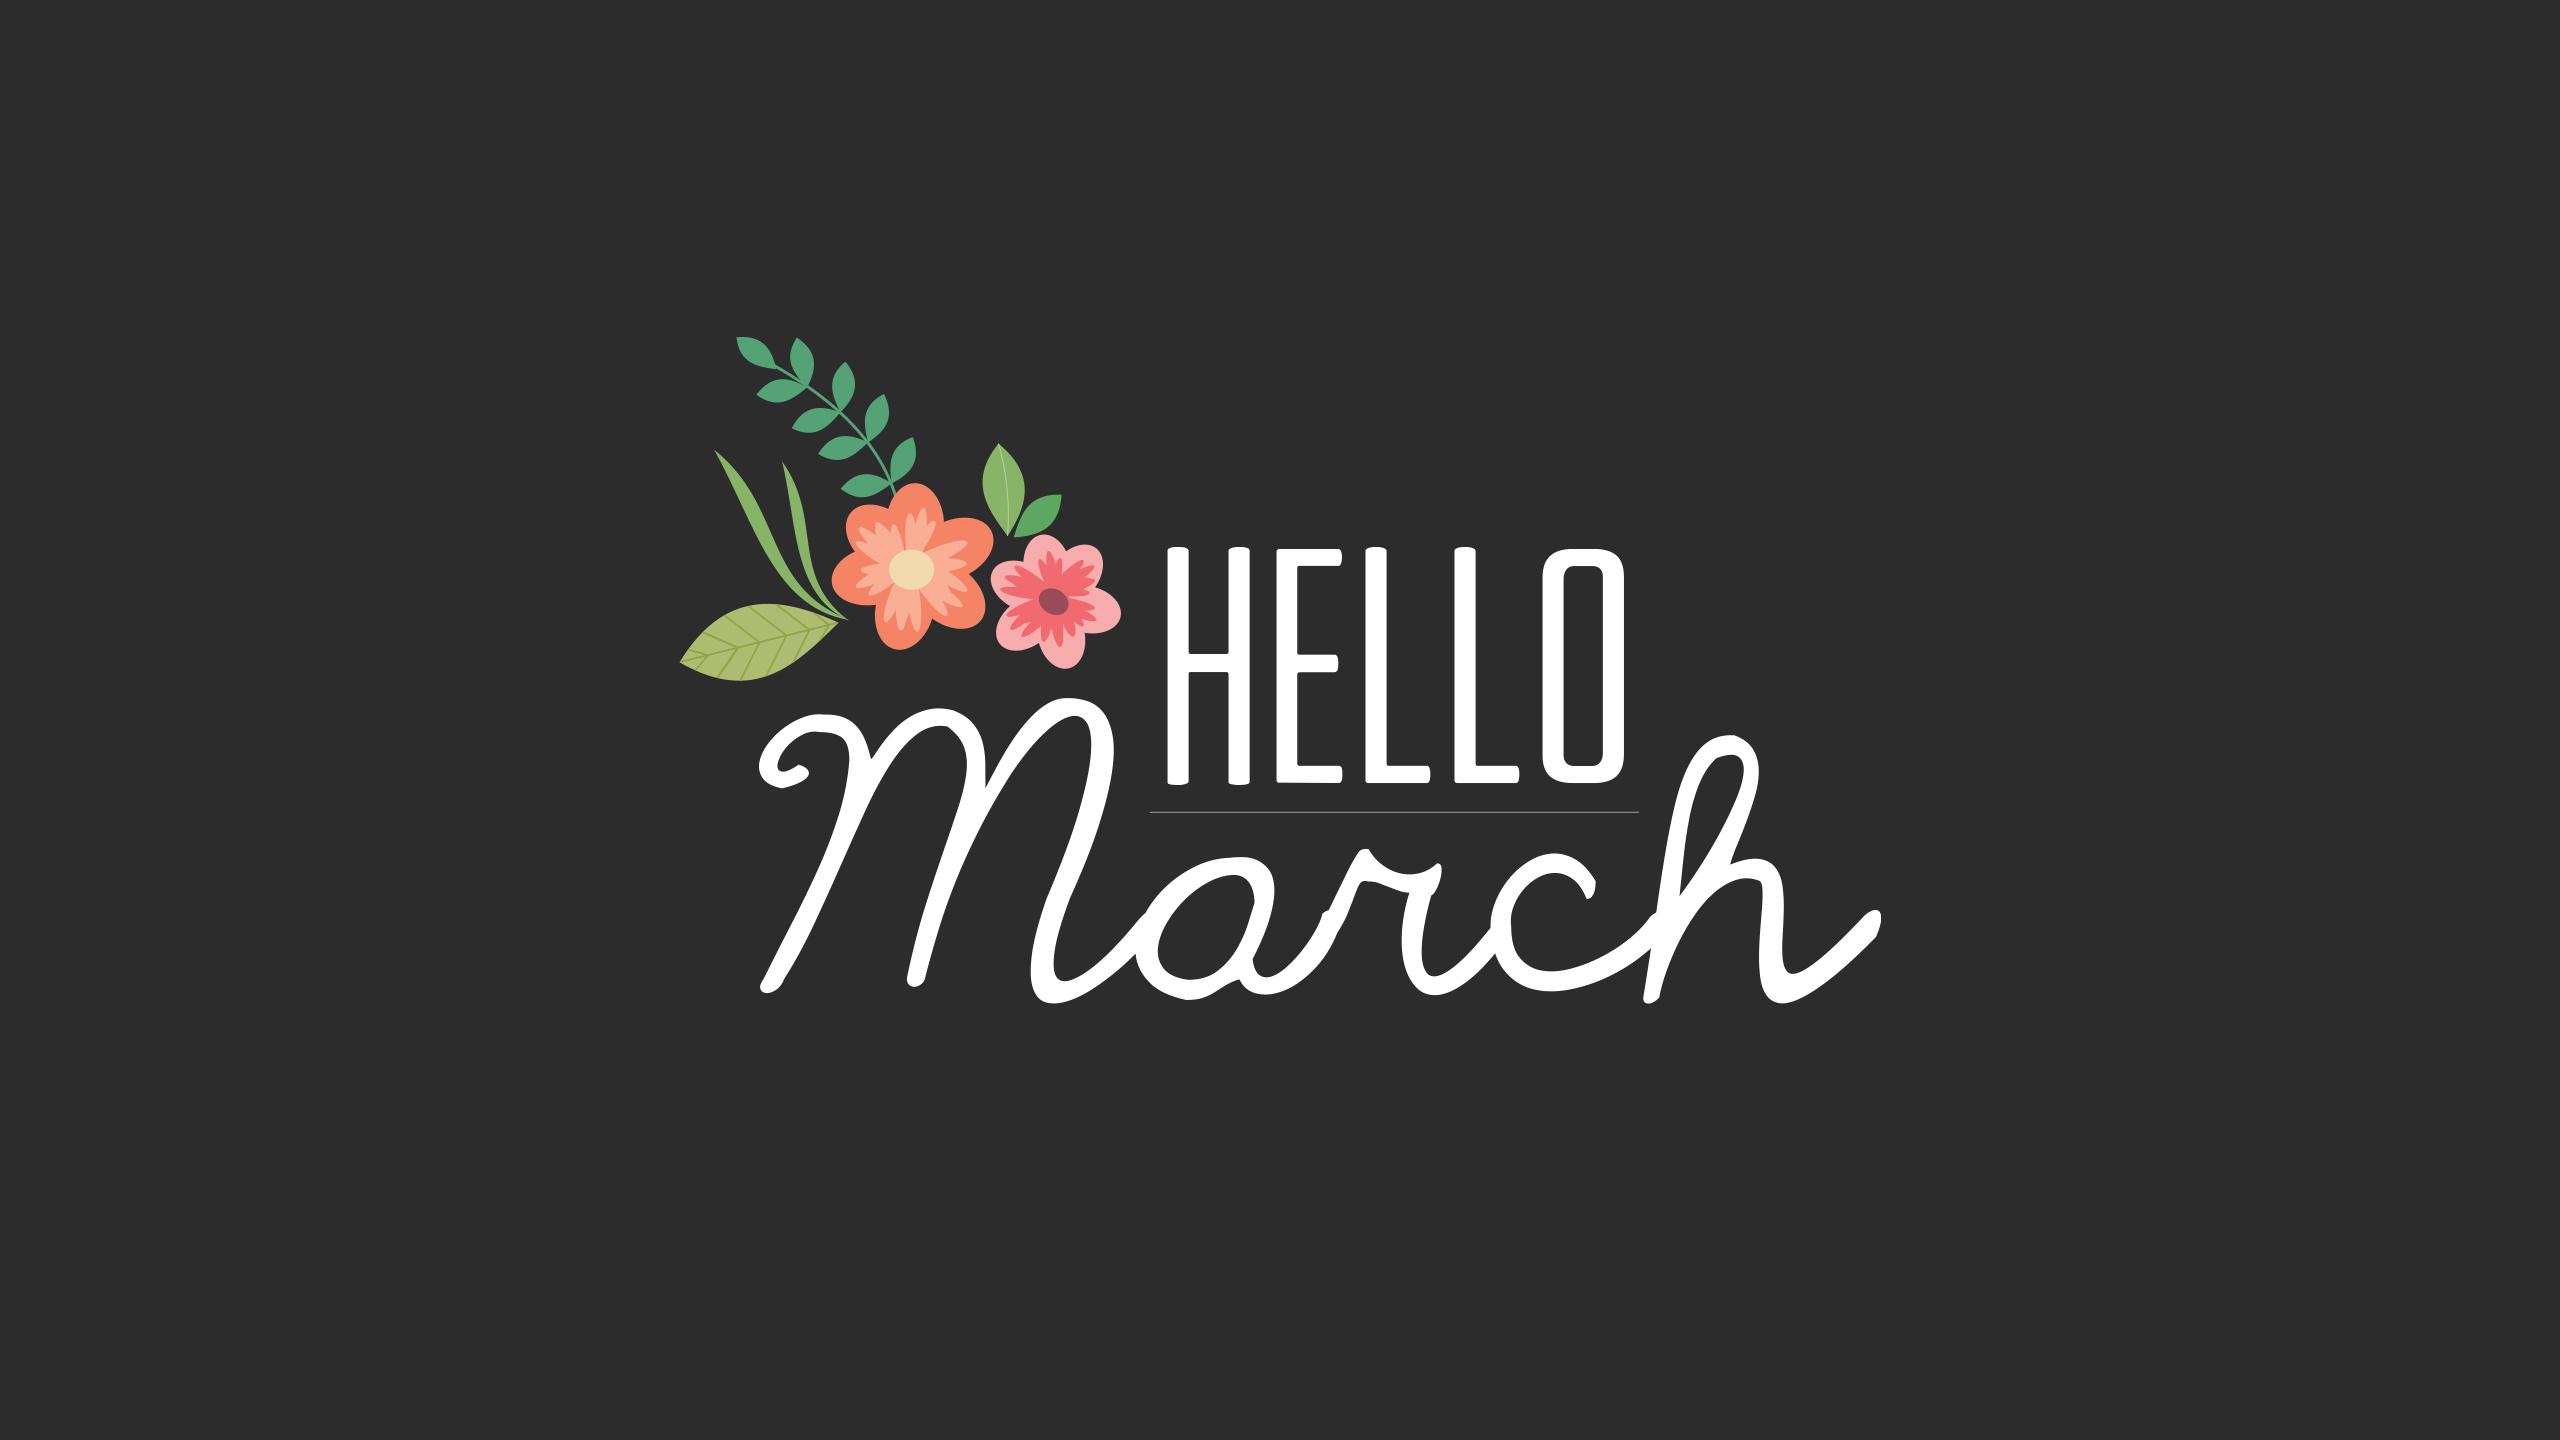 February Favorites La La Mer By Marianna Hewitt